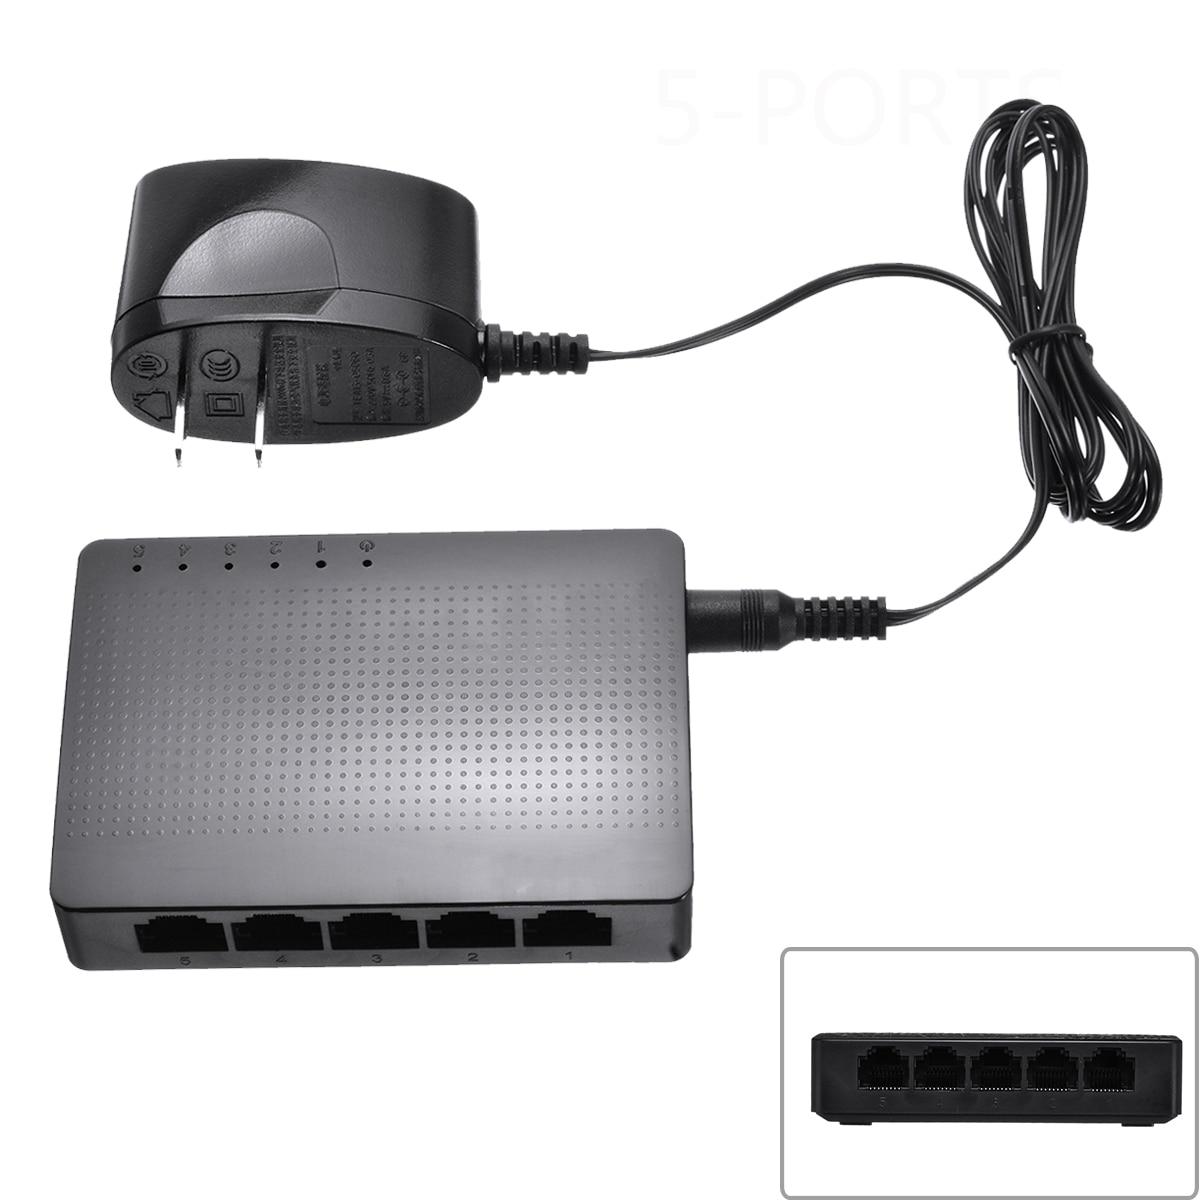 1PC Ten-da SG105 5-port 1000M Desktop Gigabit Ethernet Network Switch LAN Hub With US Power Adapter USB Powered